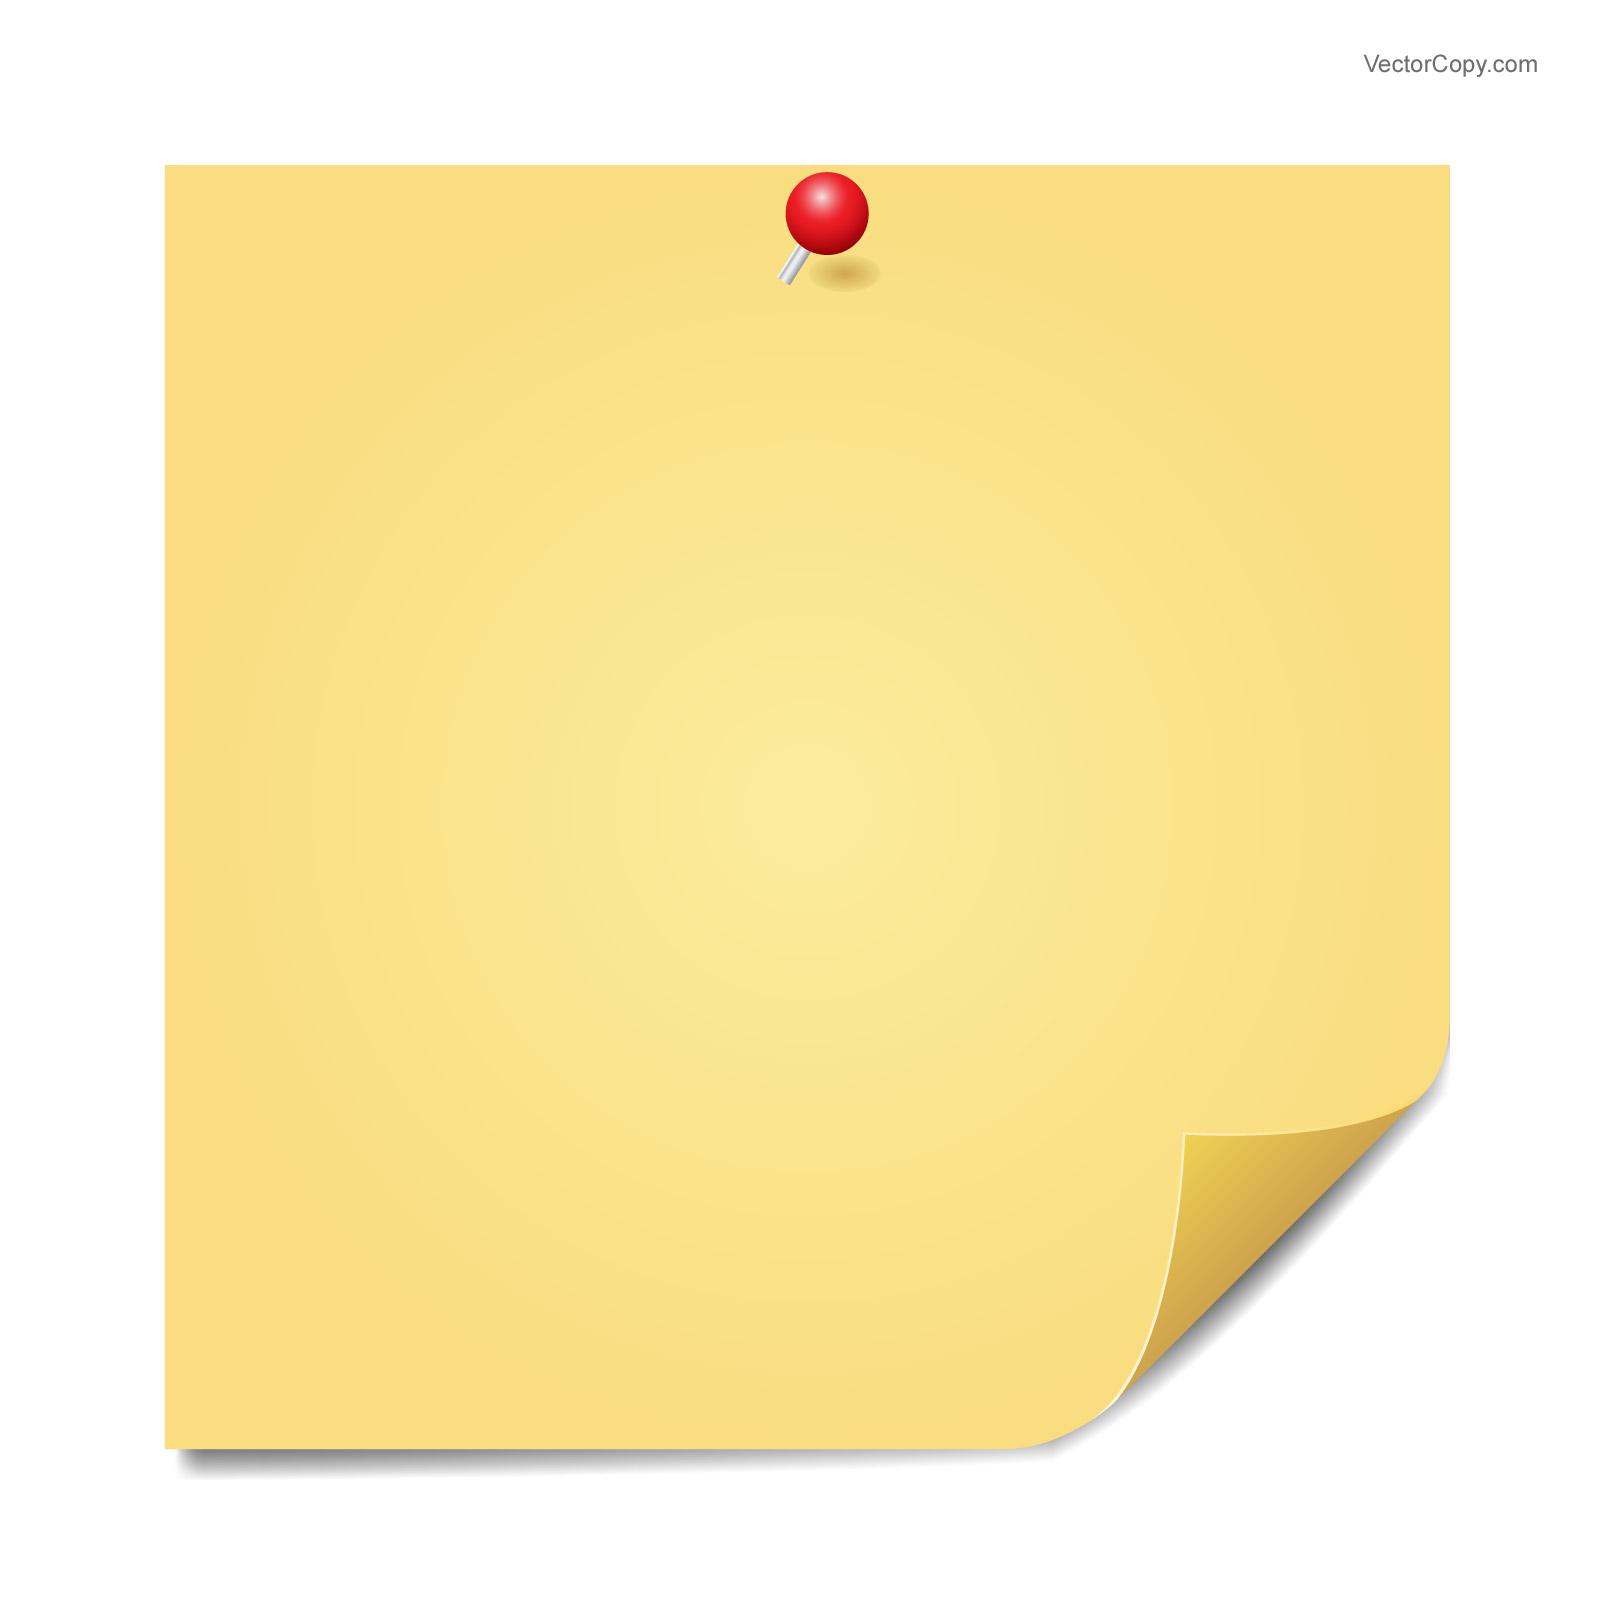 Sticky note clipart - Clipground